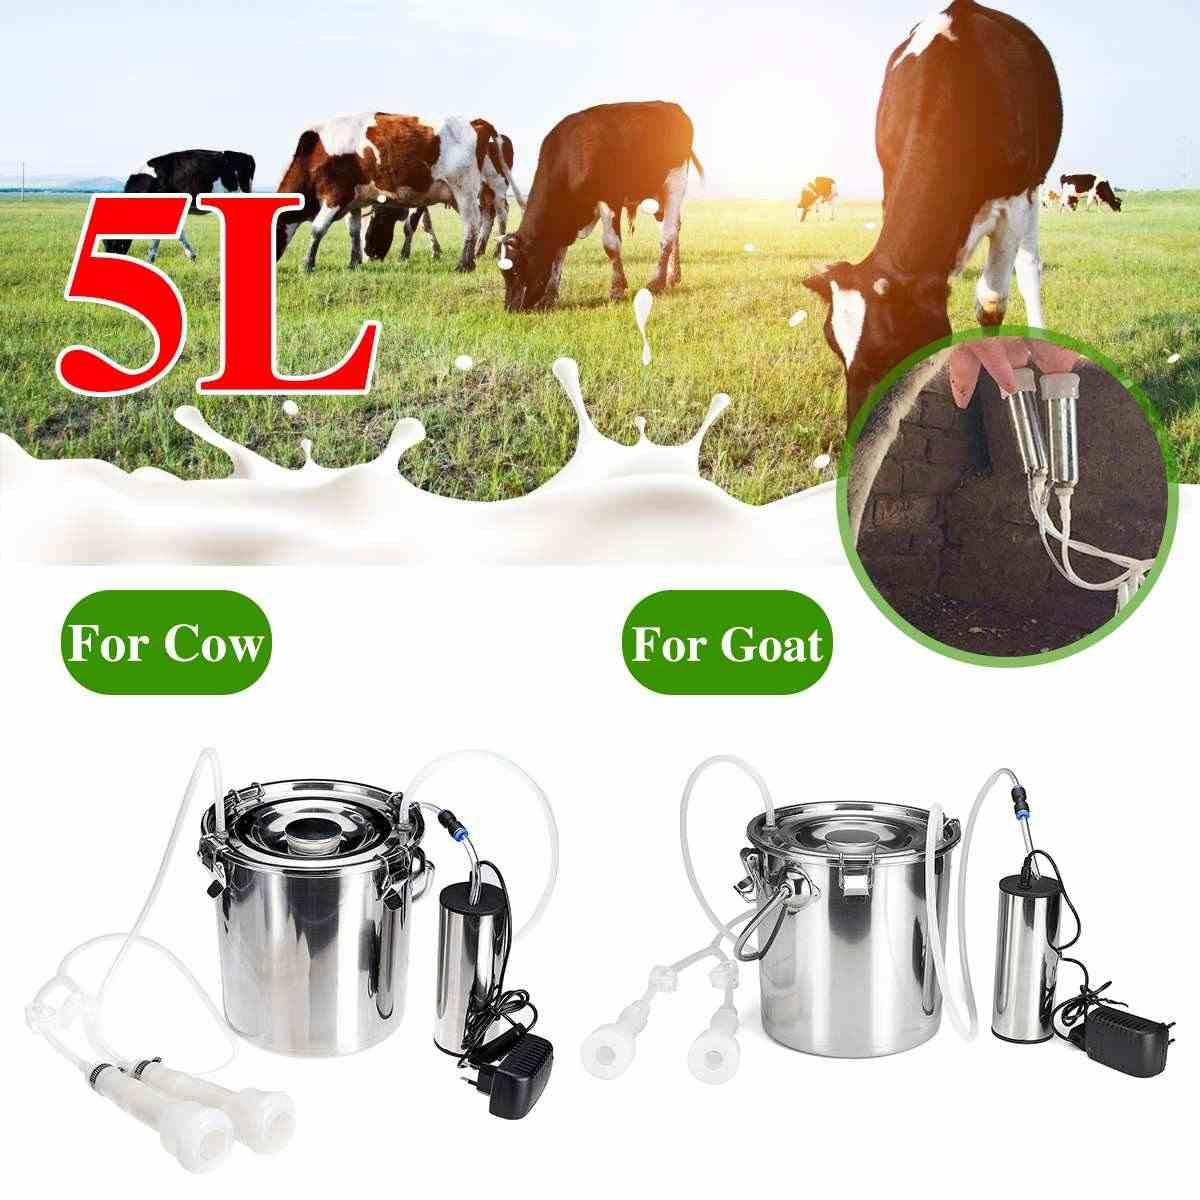 5L 真空ポンプ電動搾乳機ステンレス鋼牛ヤギ羊バケット吸引搾乳家庭用搾乳機